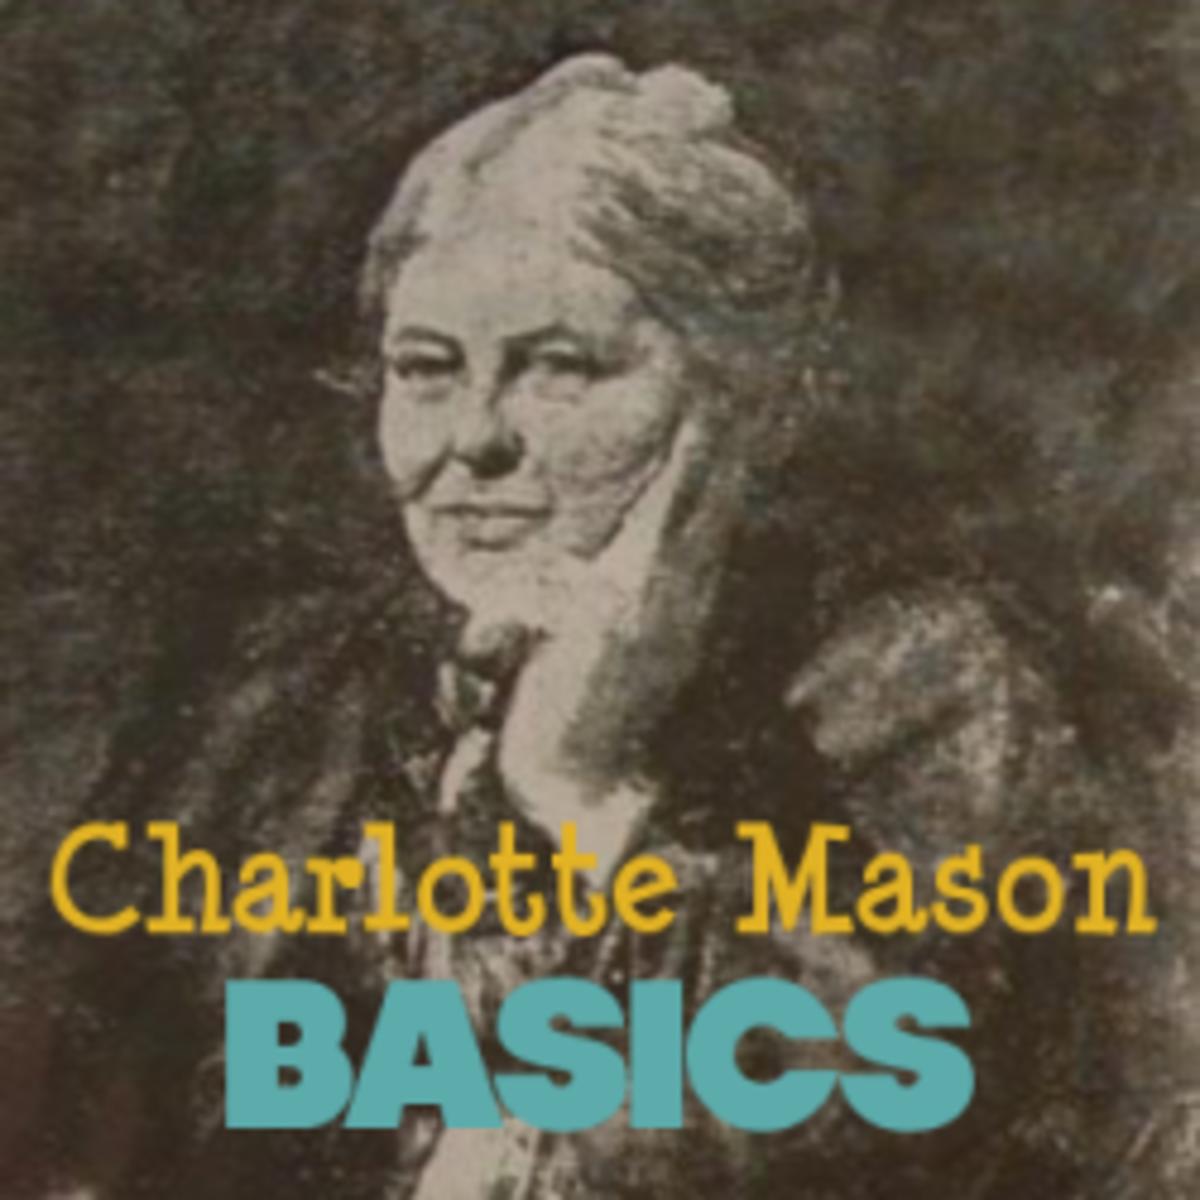 Charlotte Mason Basics